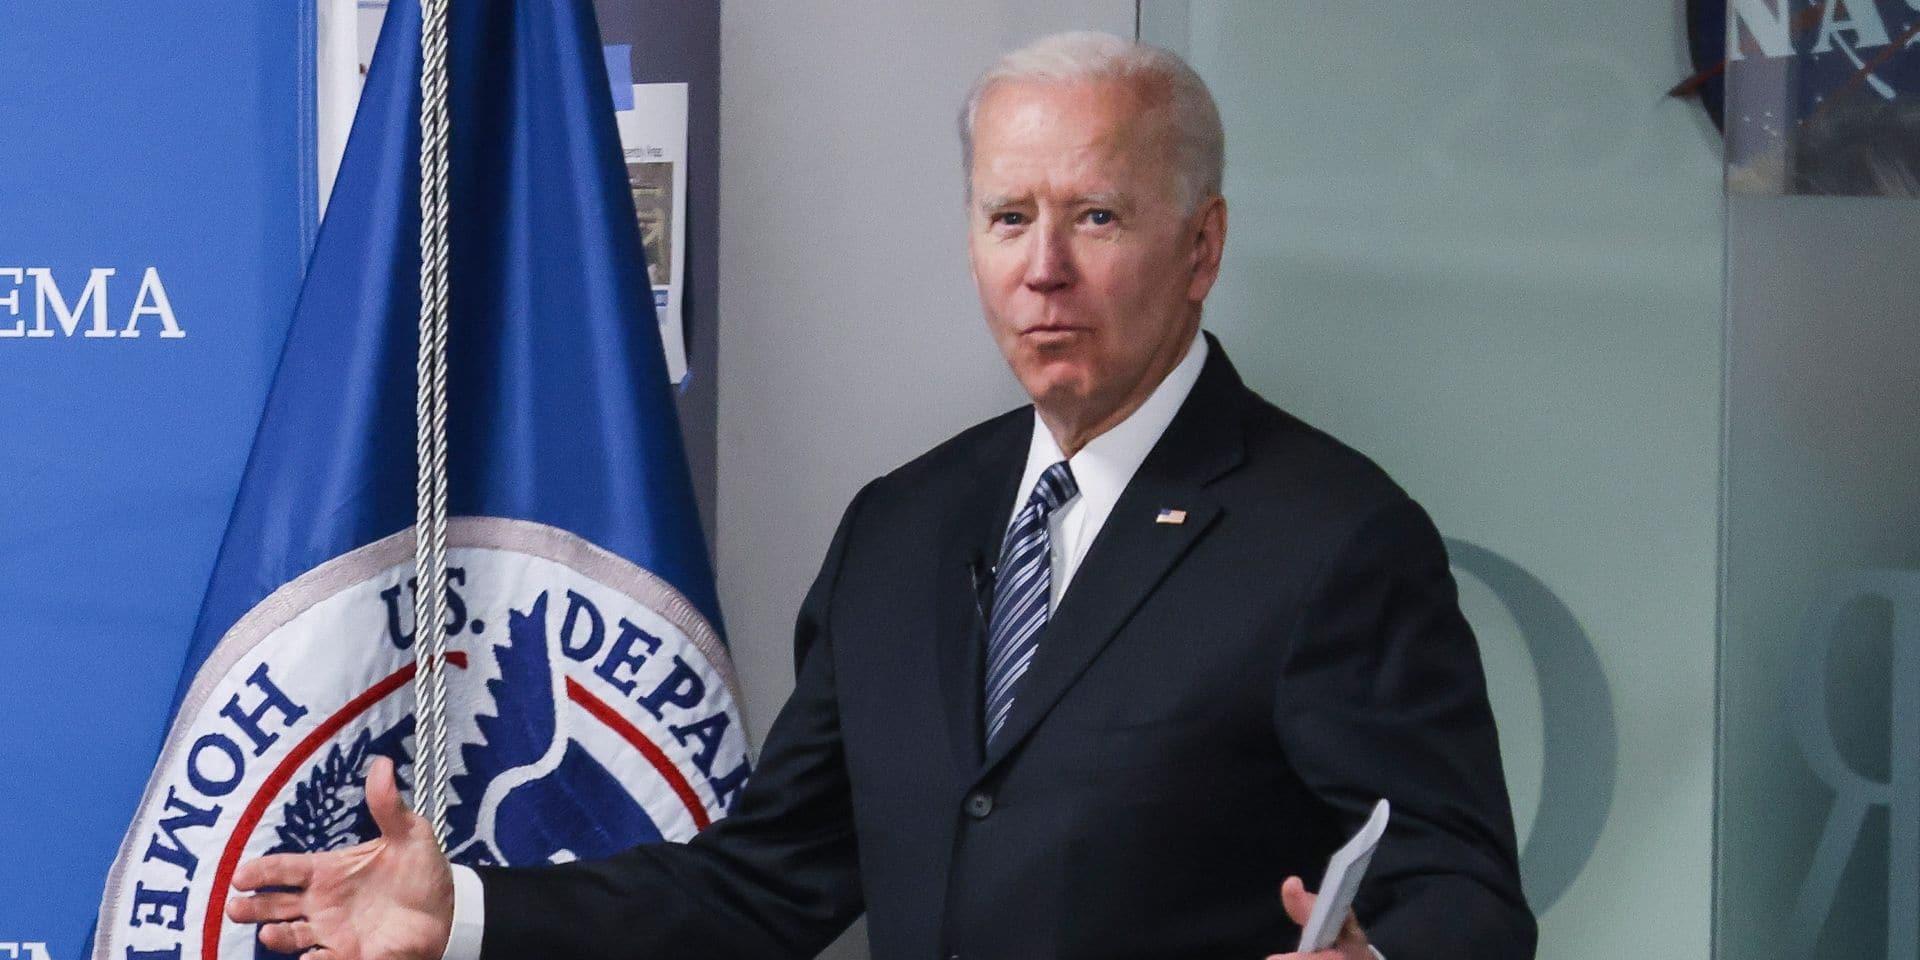 Joe Biden reçoit les proches de George Floyd, mais la grande loi attendra